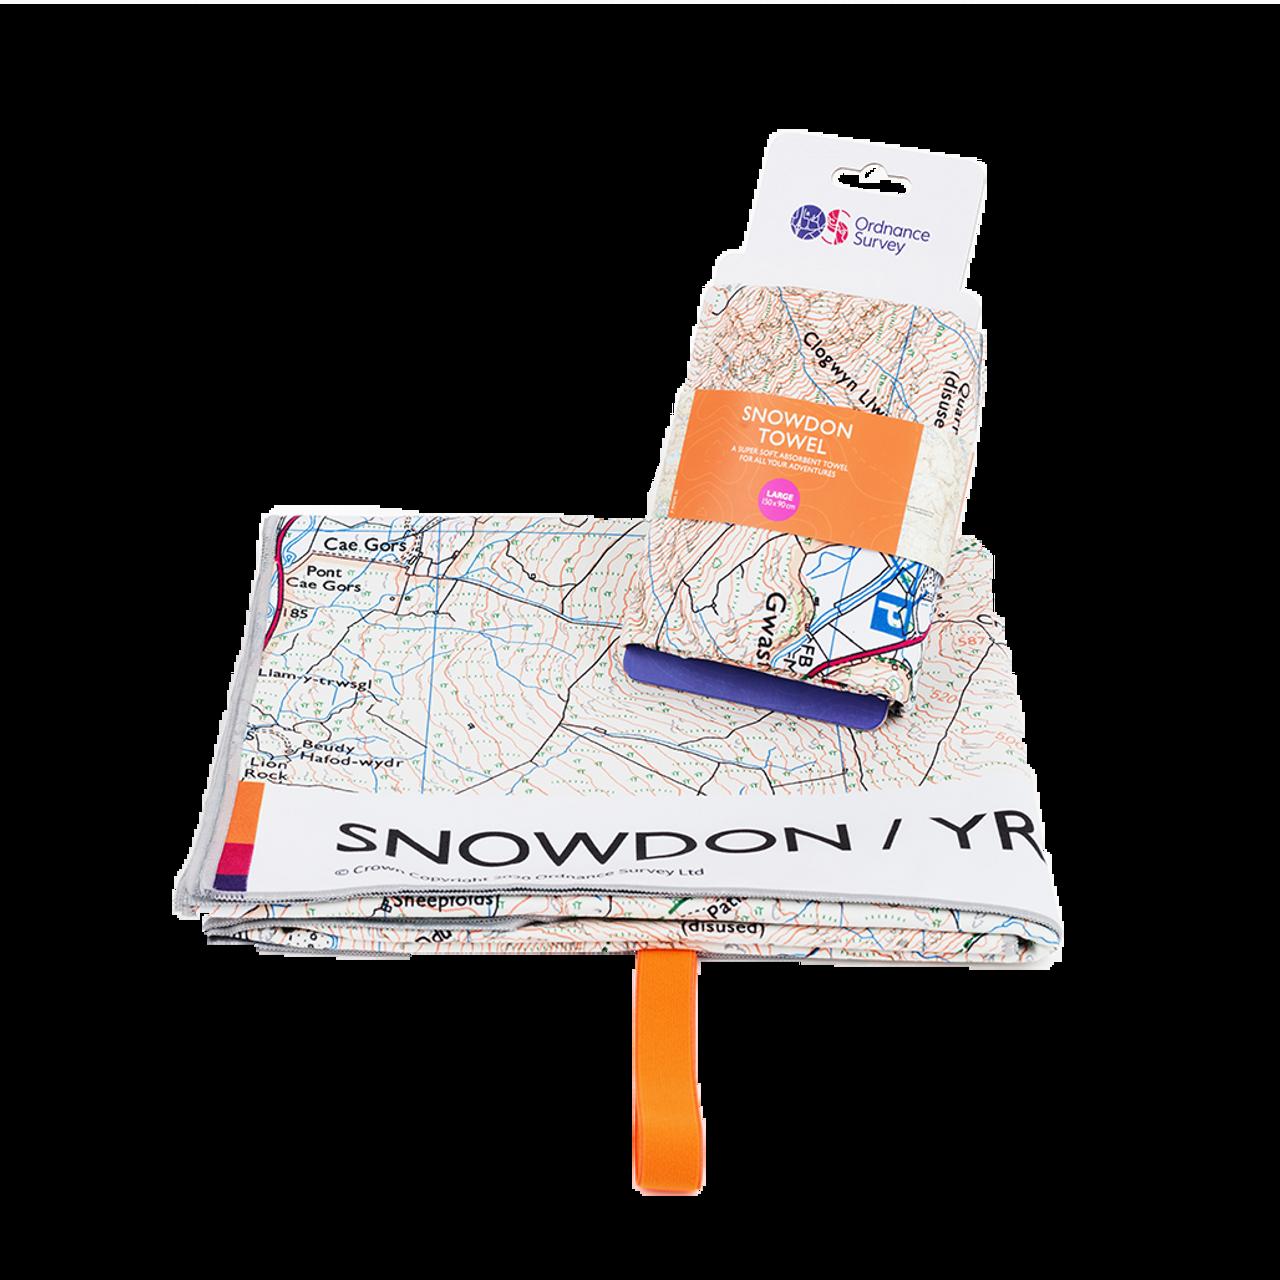 Os Snowdon Large Towel